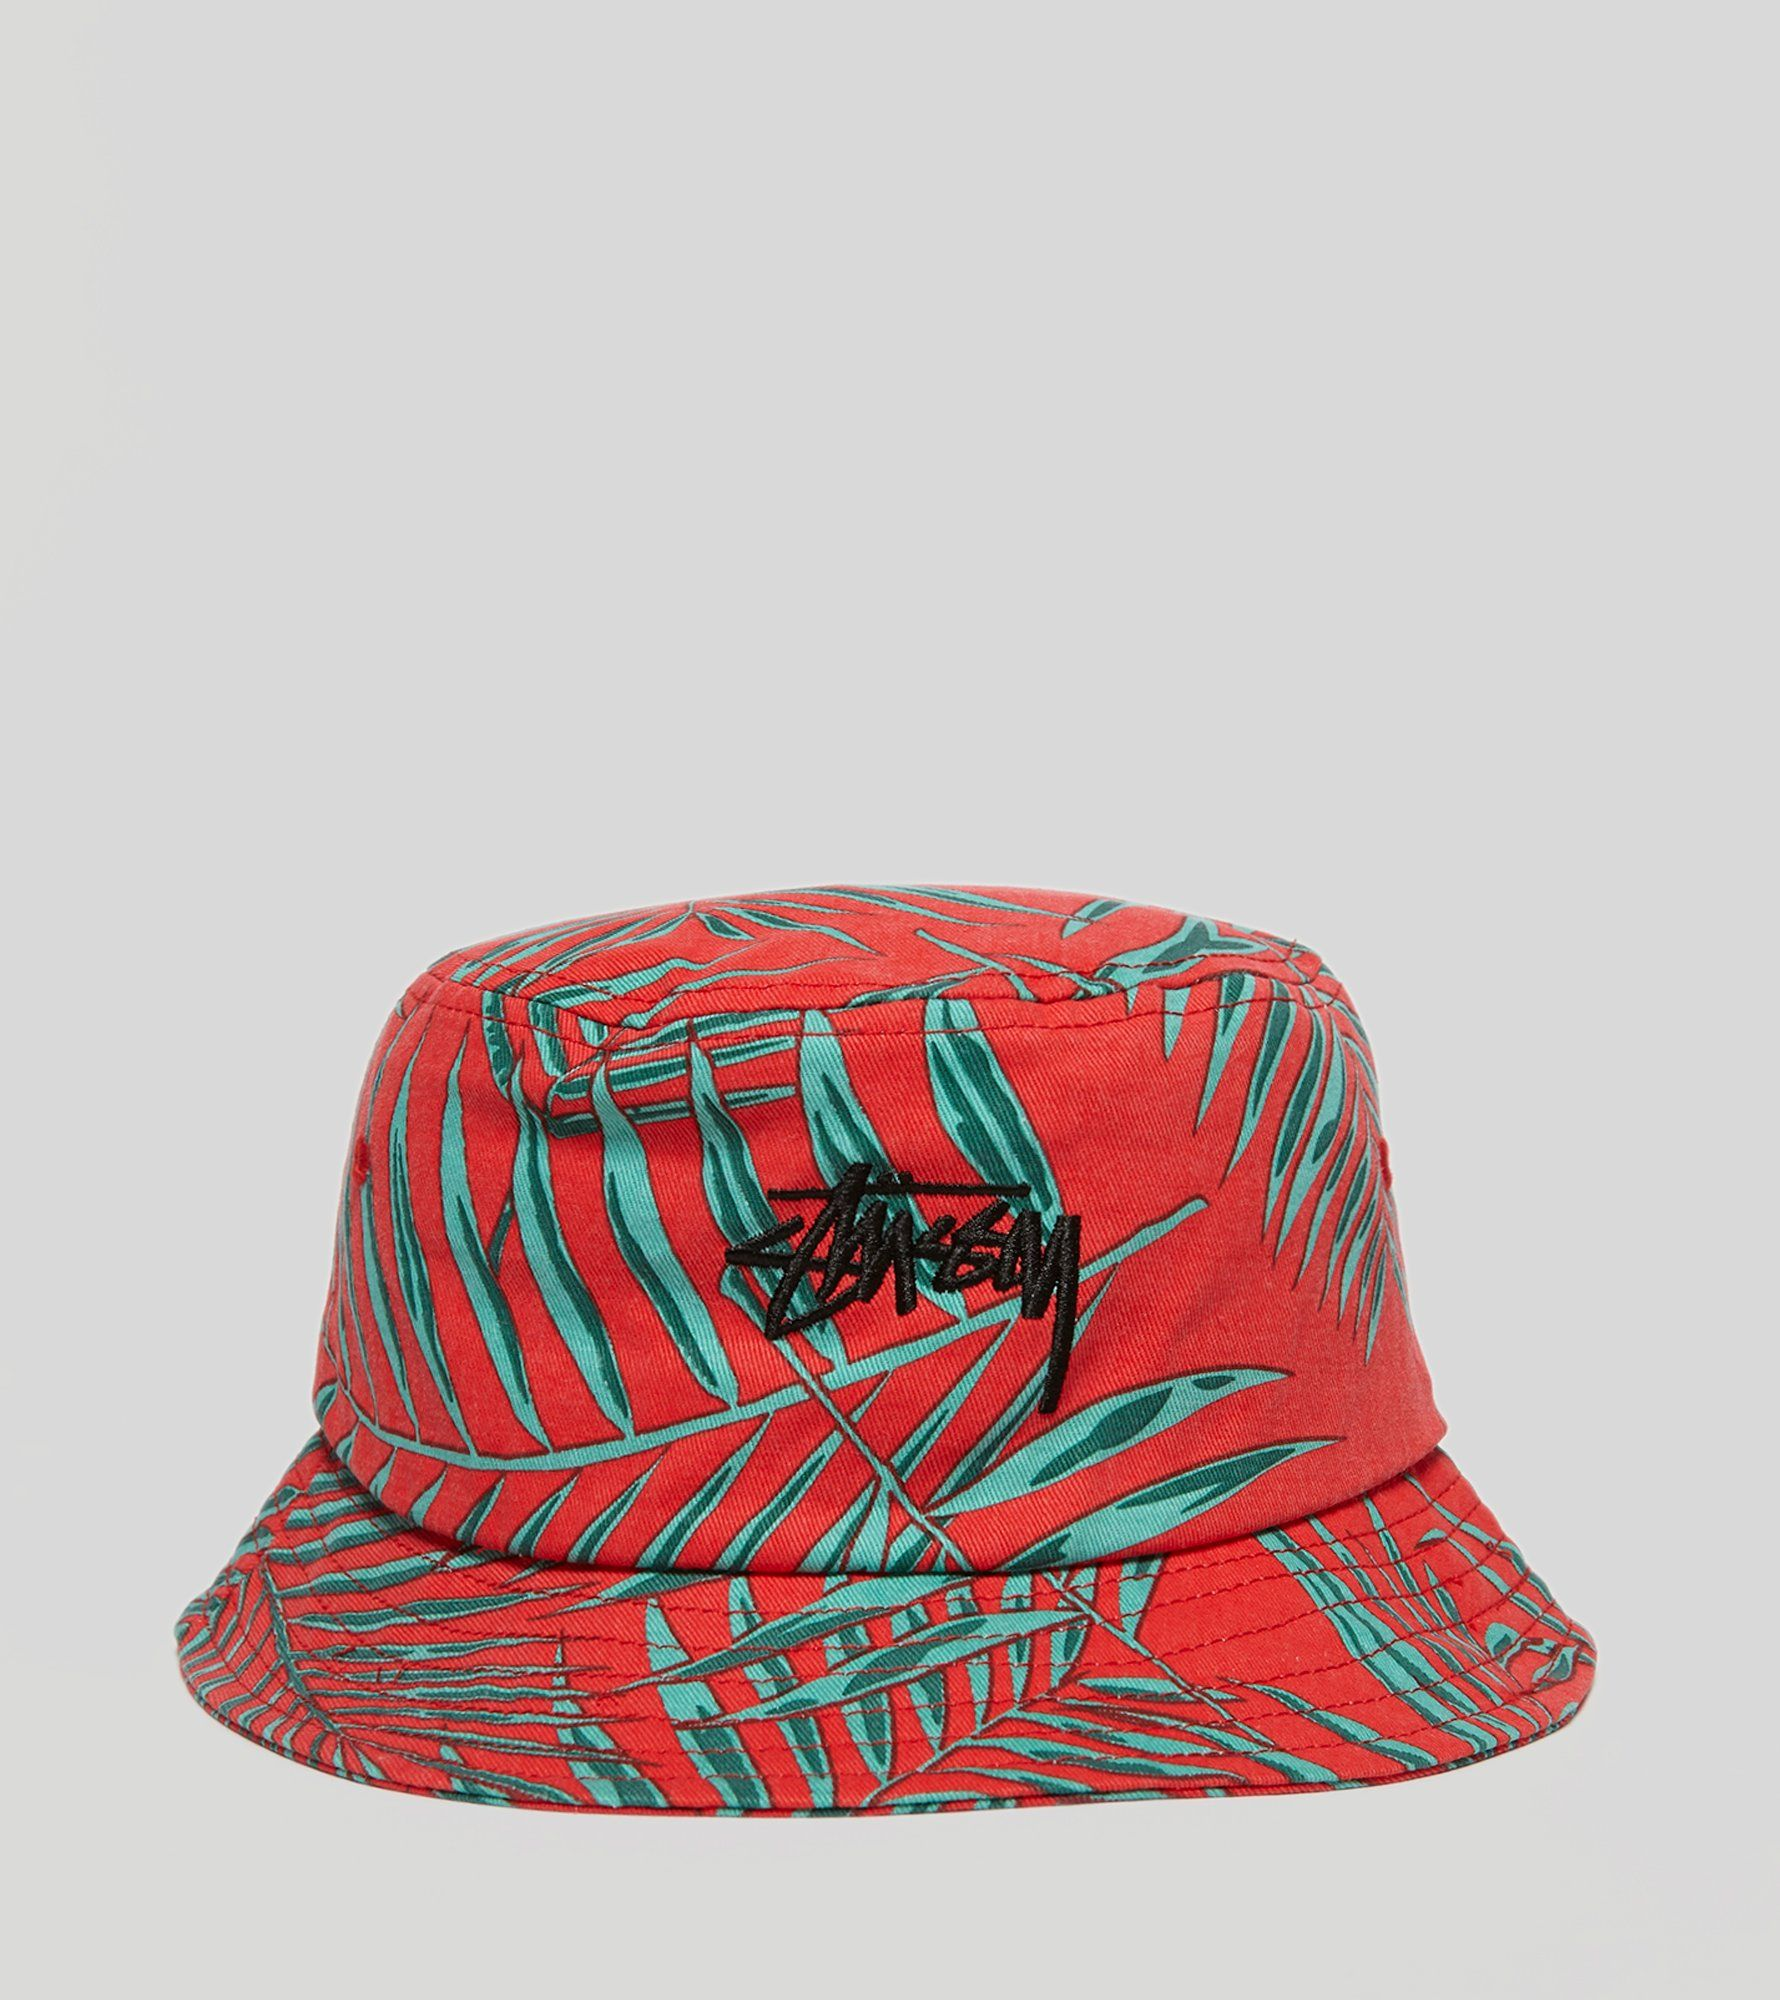 stussy bucket hat price - HD1780×2000